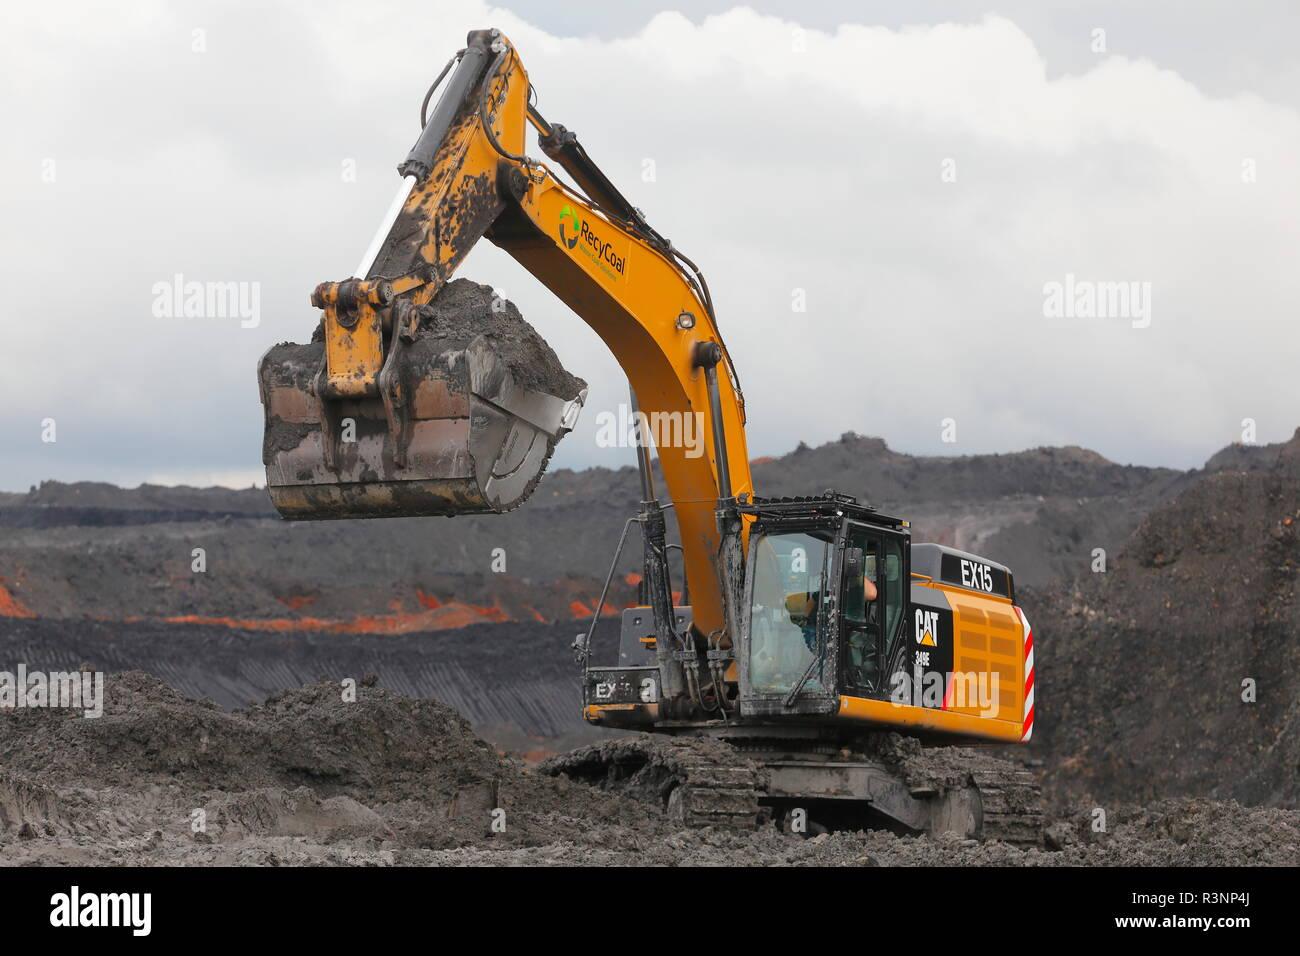 A Caterpillar 349E used for loading dump trucks on the